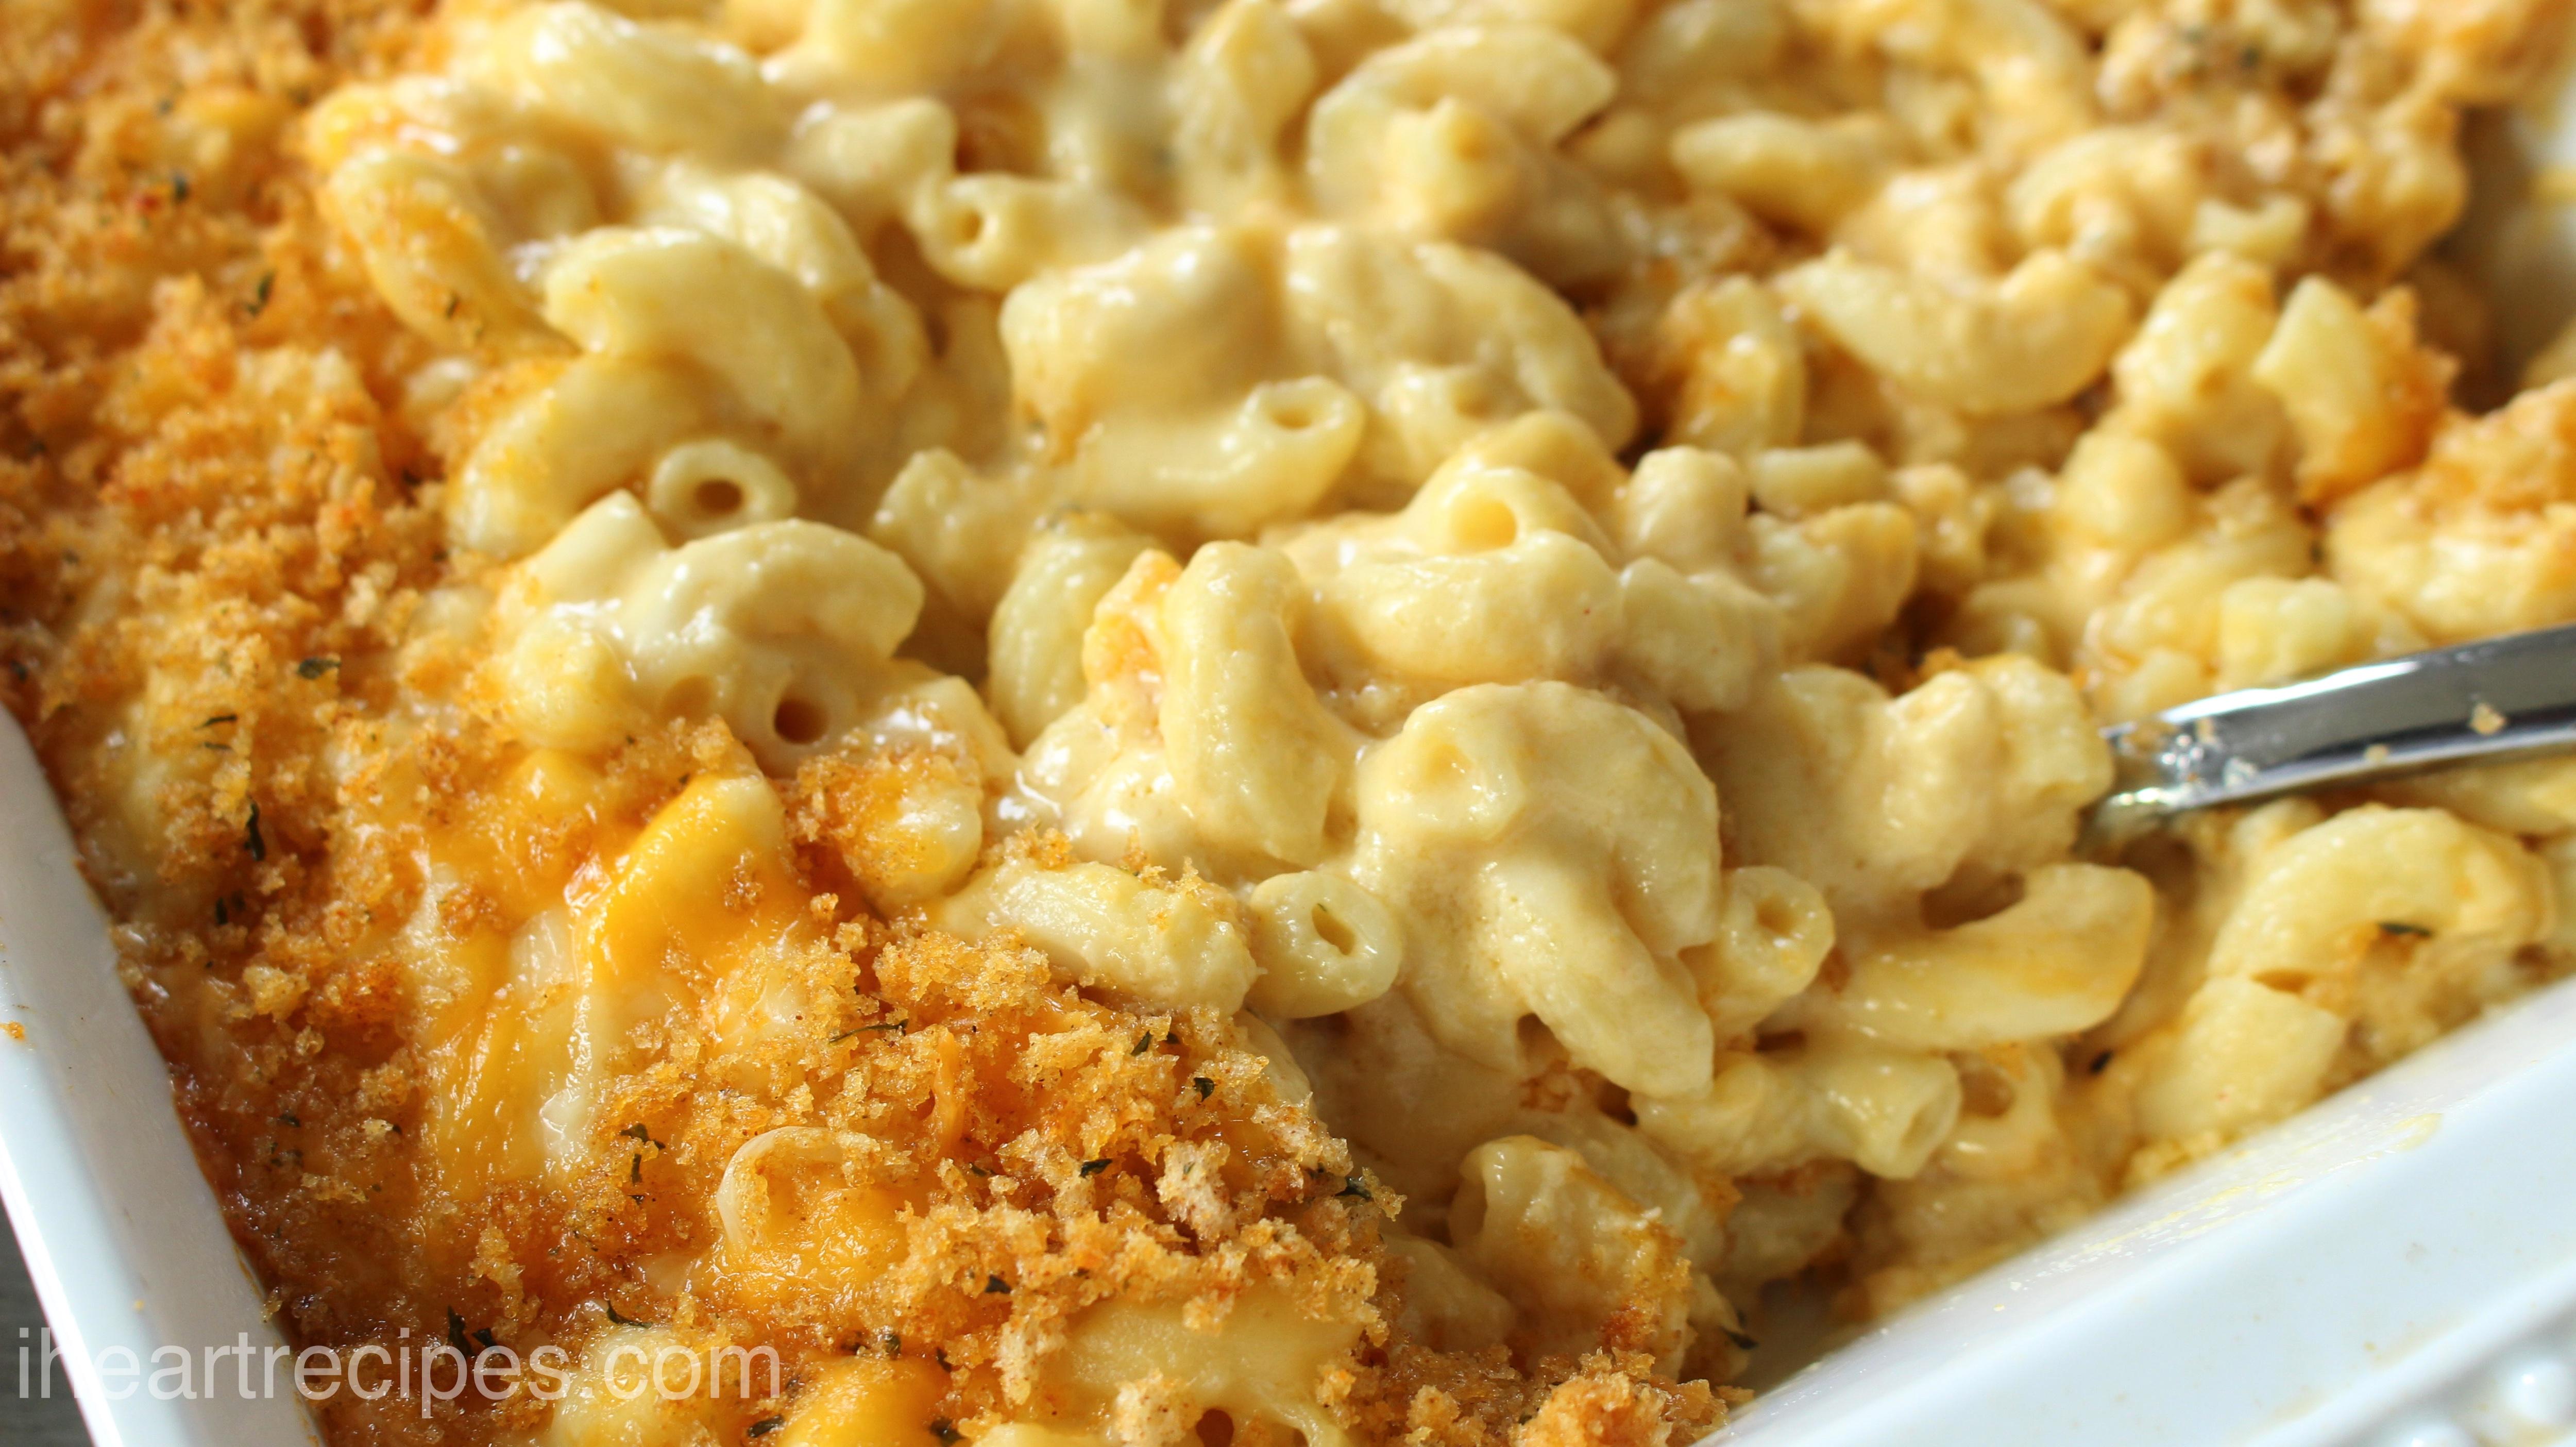 Southern Baked Macaroni Cheese I Heart Recipes